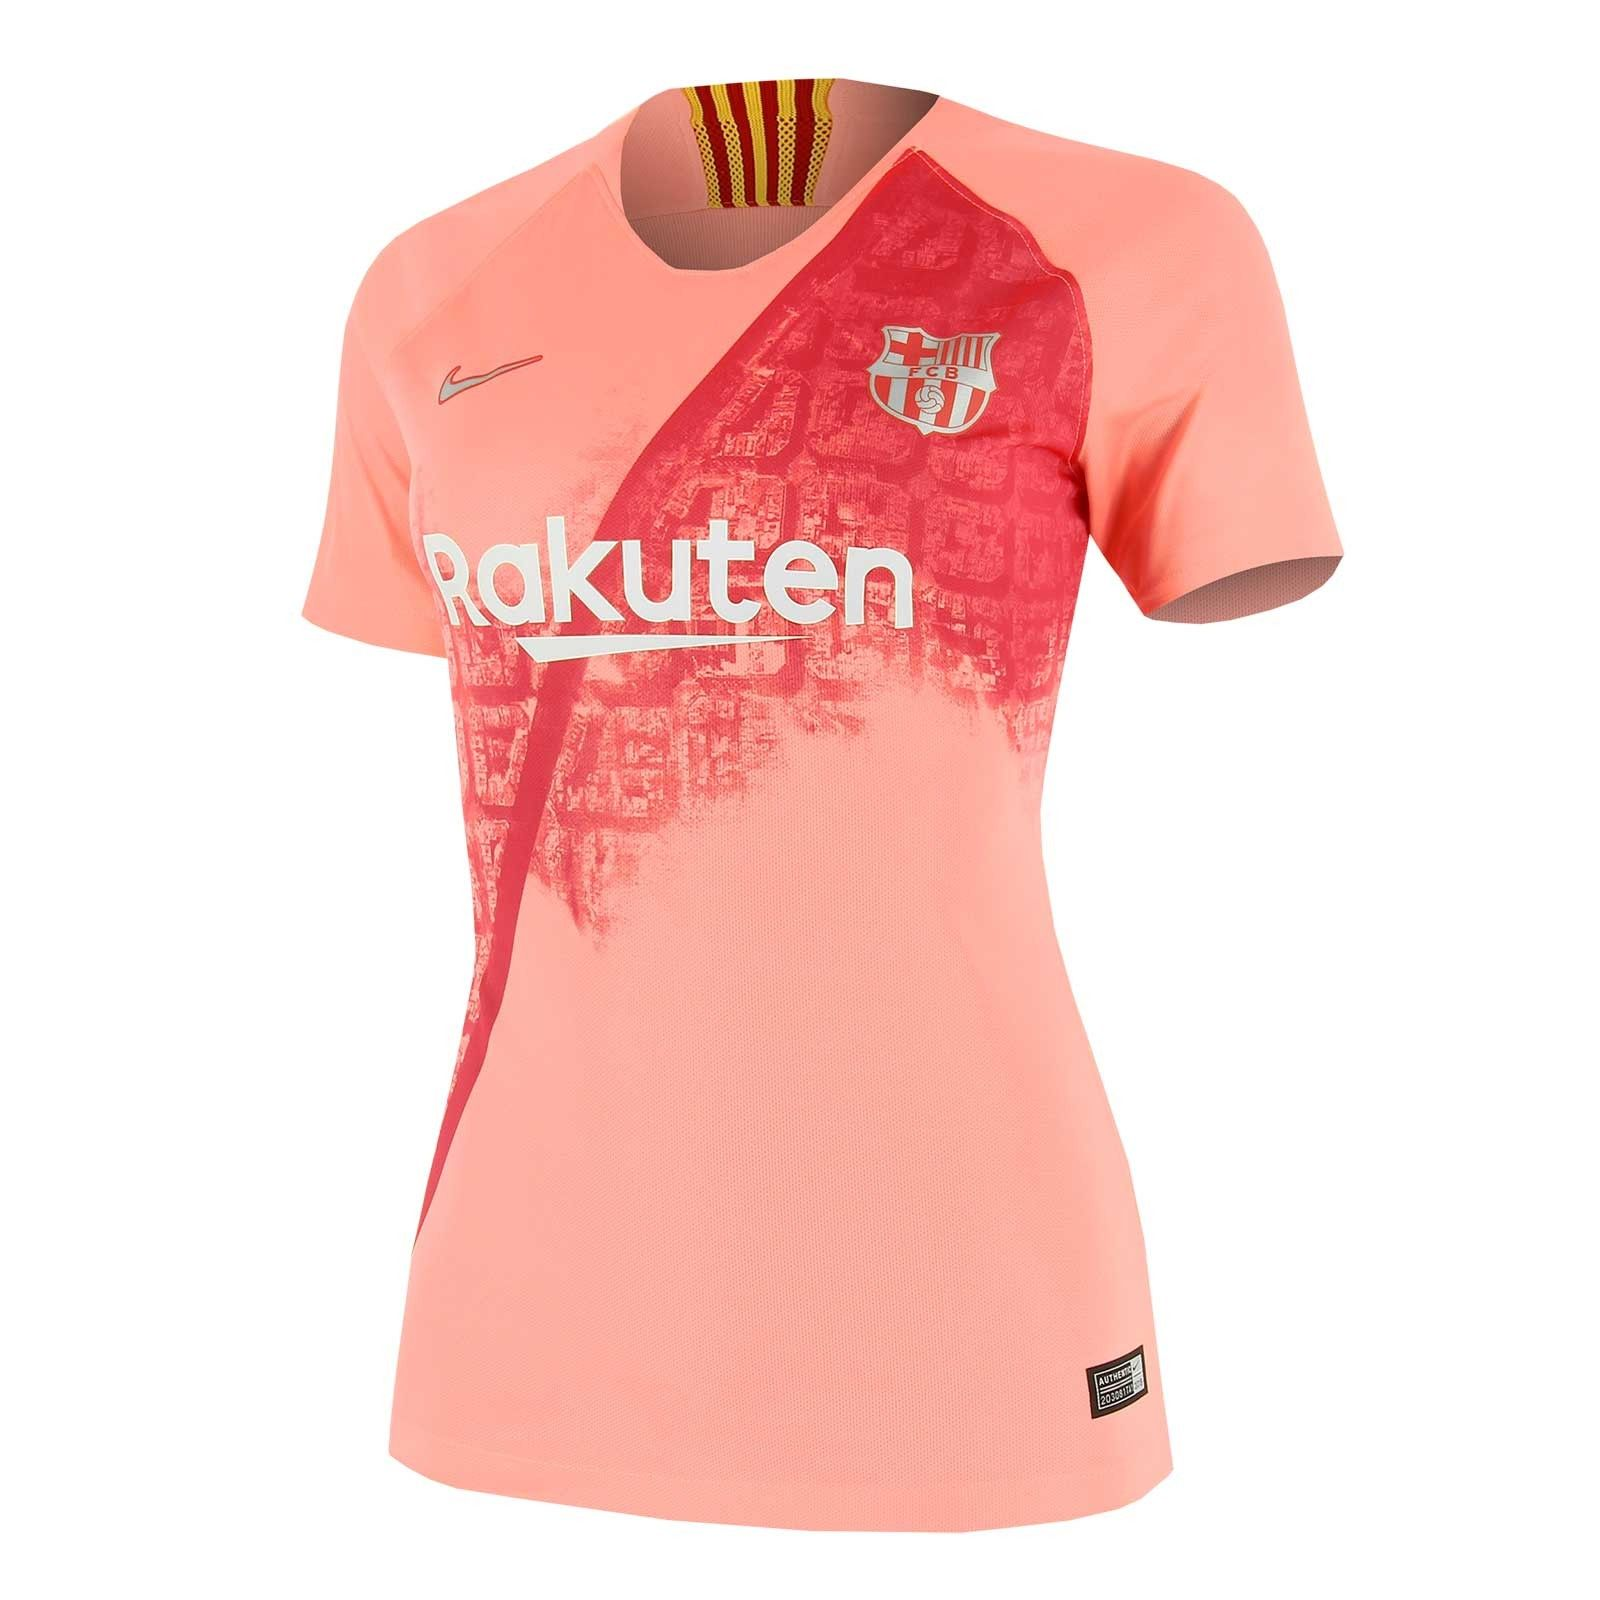 e173a44af0651 Camiseta Nike Barcelona 3a mujer 2018 2019 Stadium